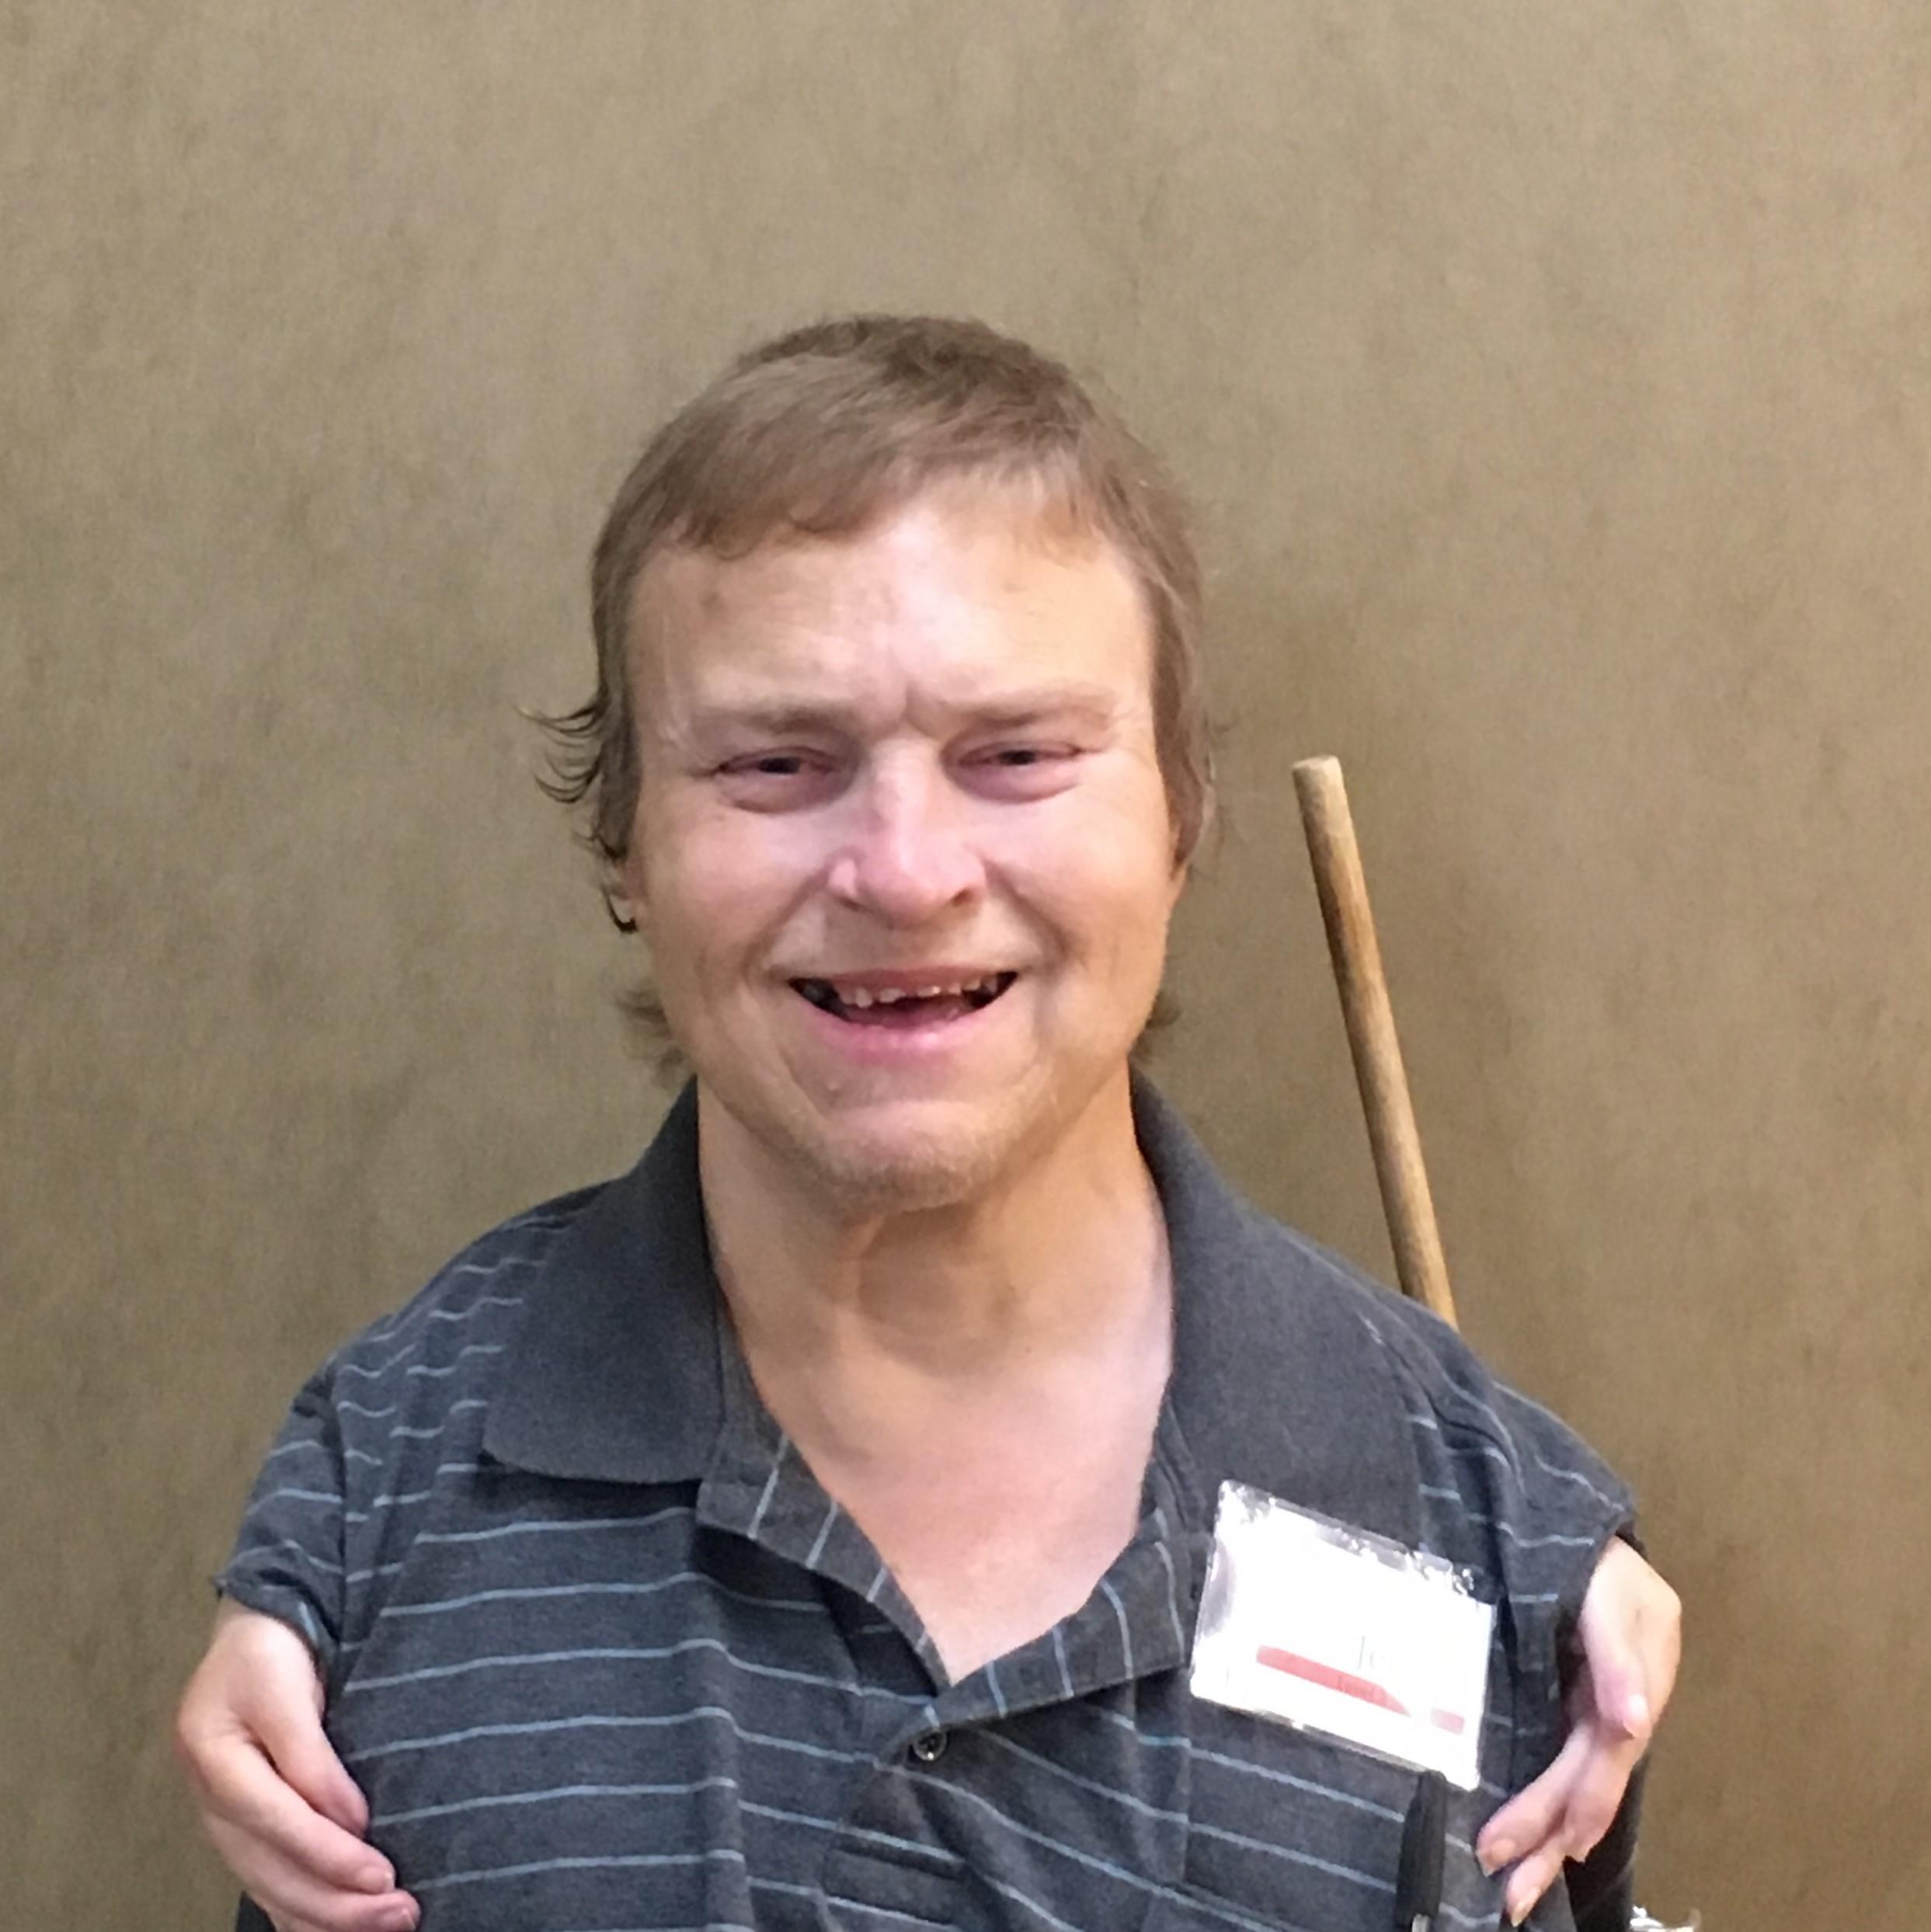 Jeff Sept 2018